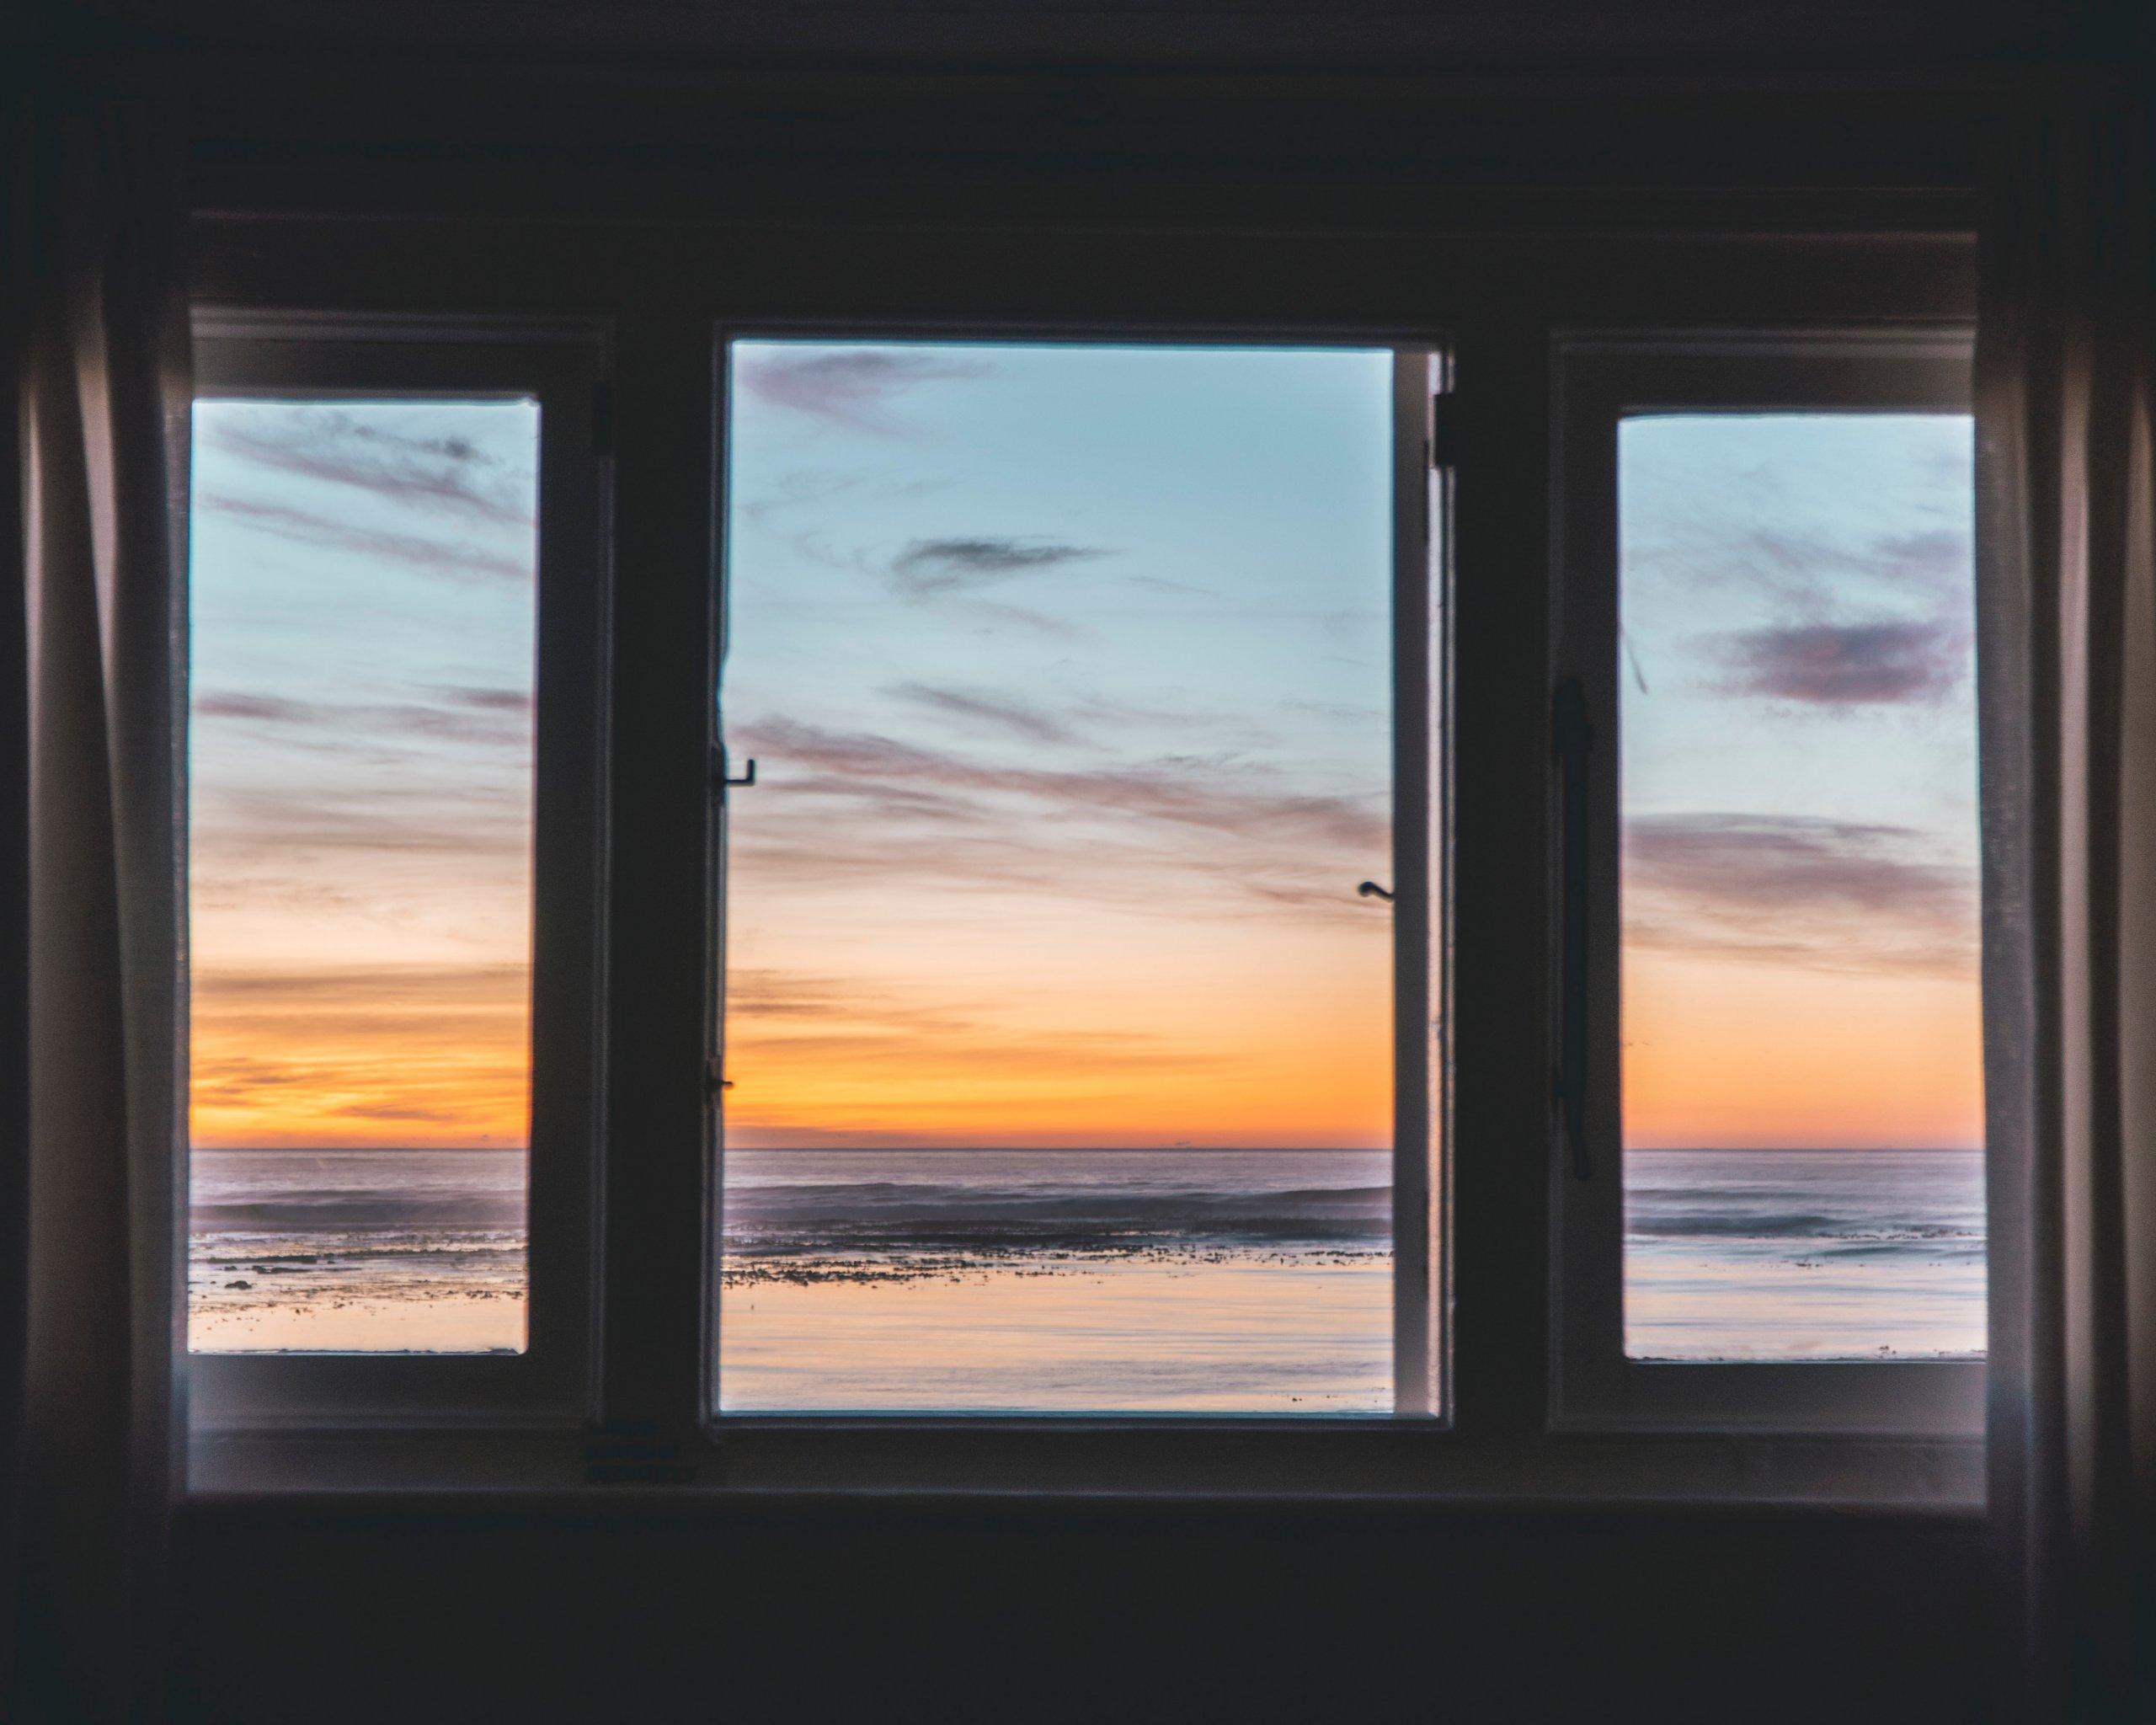 Prozor s dvostrukim ili trostrukim oknom?